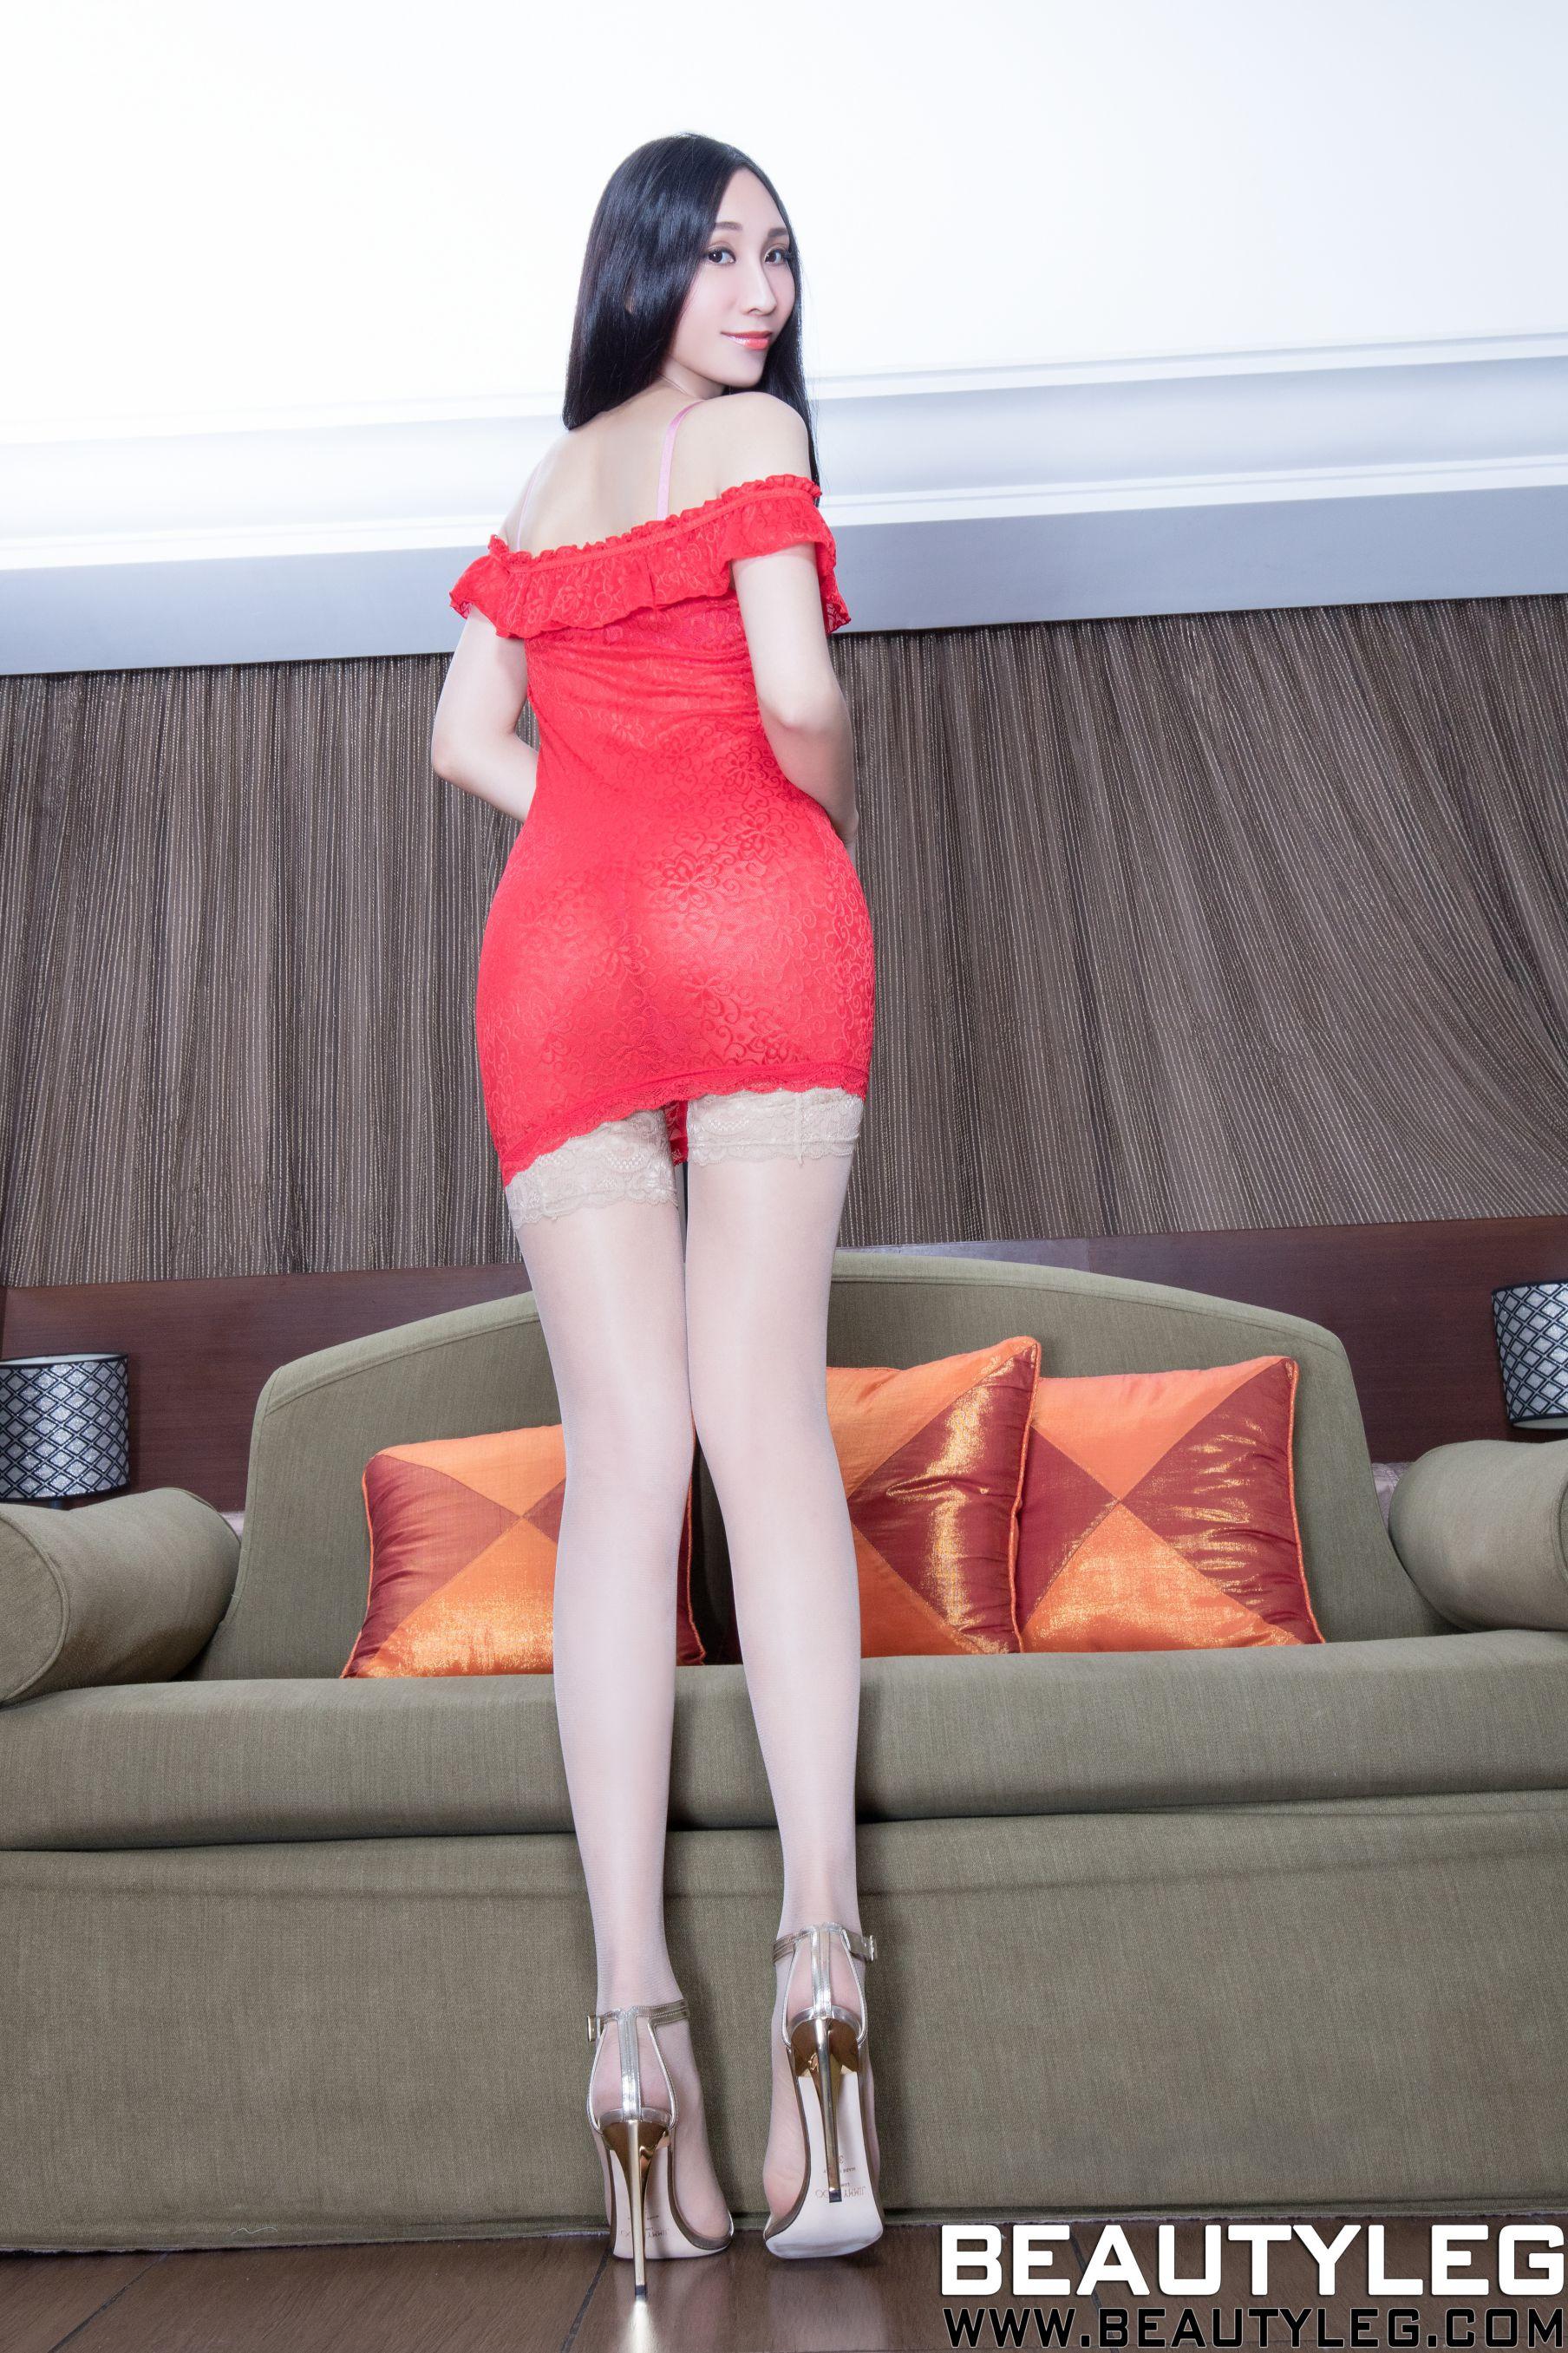 VOL.1322 [Beautyleg]丝袜美腿网衣:吴美希(腿模Miki)超高清个人性感漂亮大图(42P)